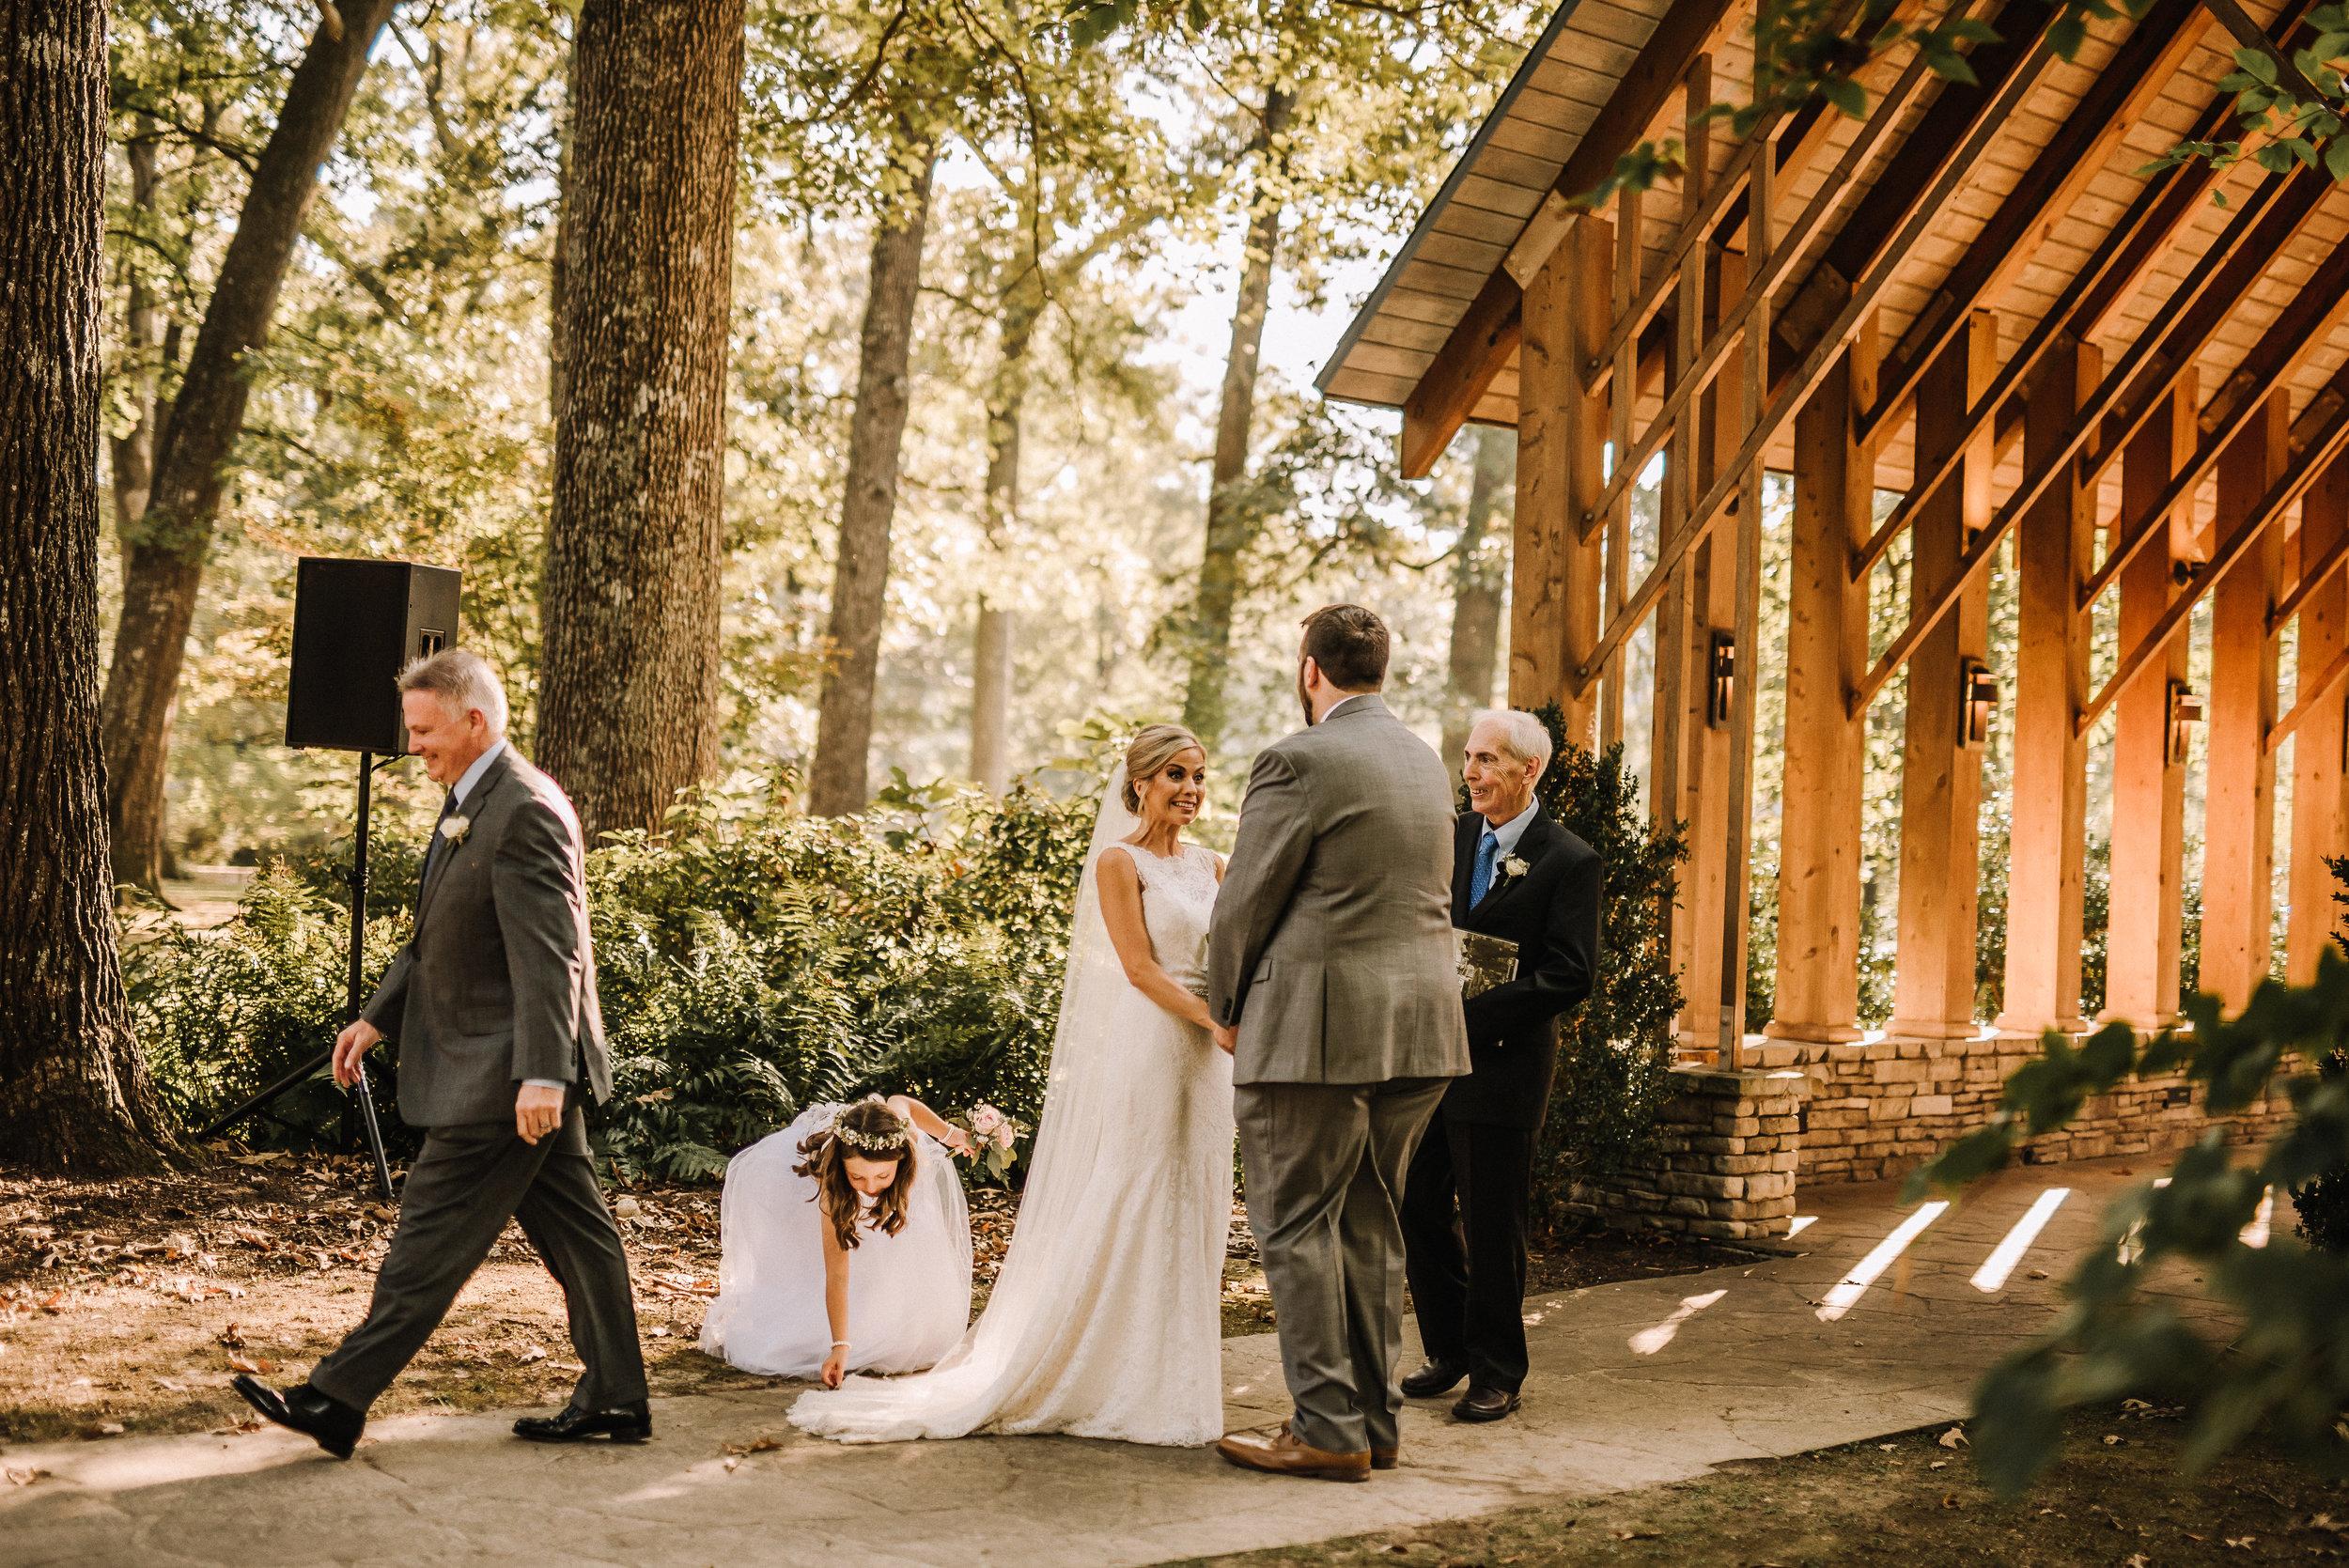 O'Brien-Wedding_Botanic-Gardens_Ashley-Benham-Photography-351.jpg